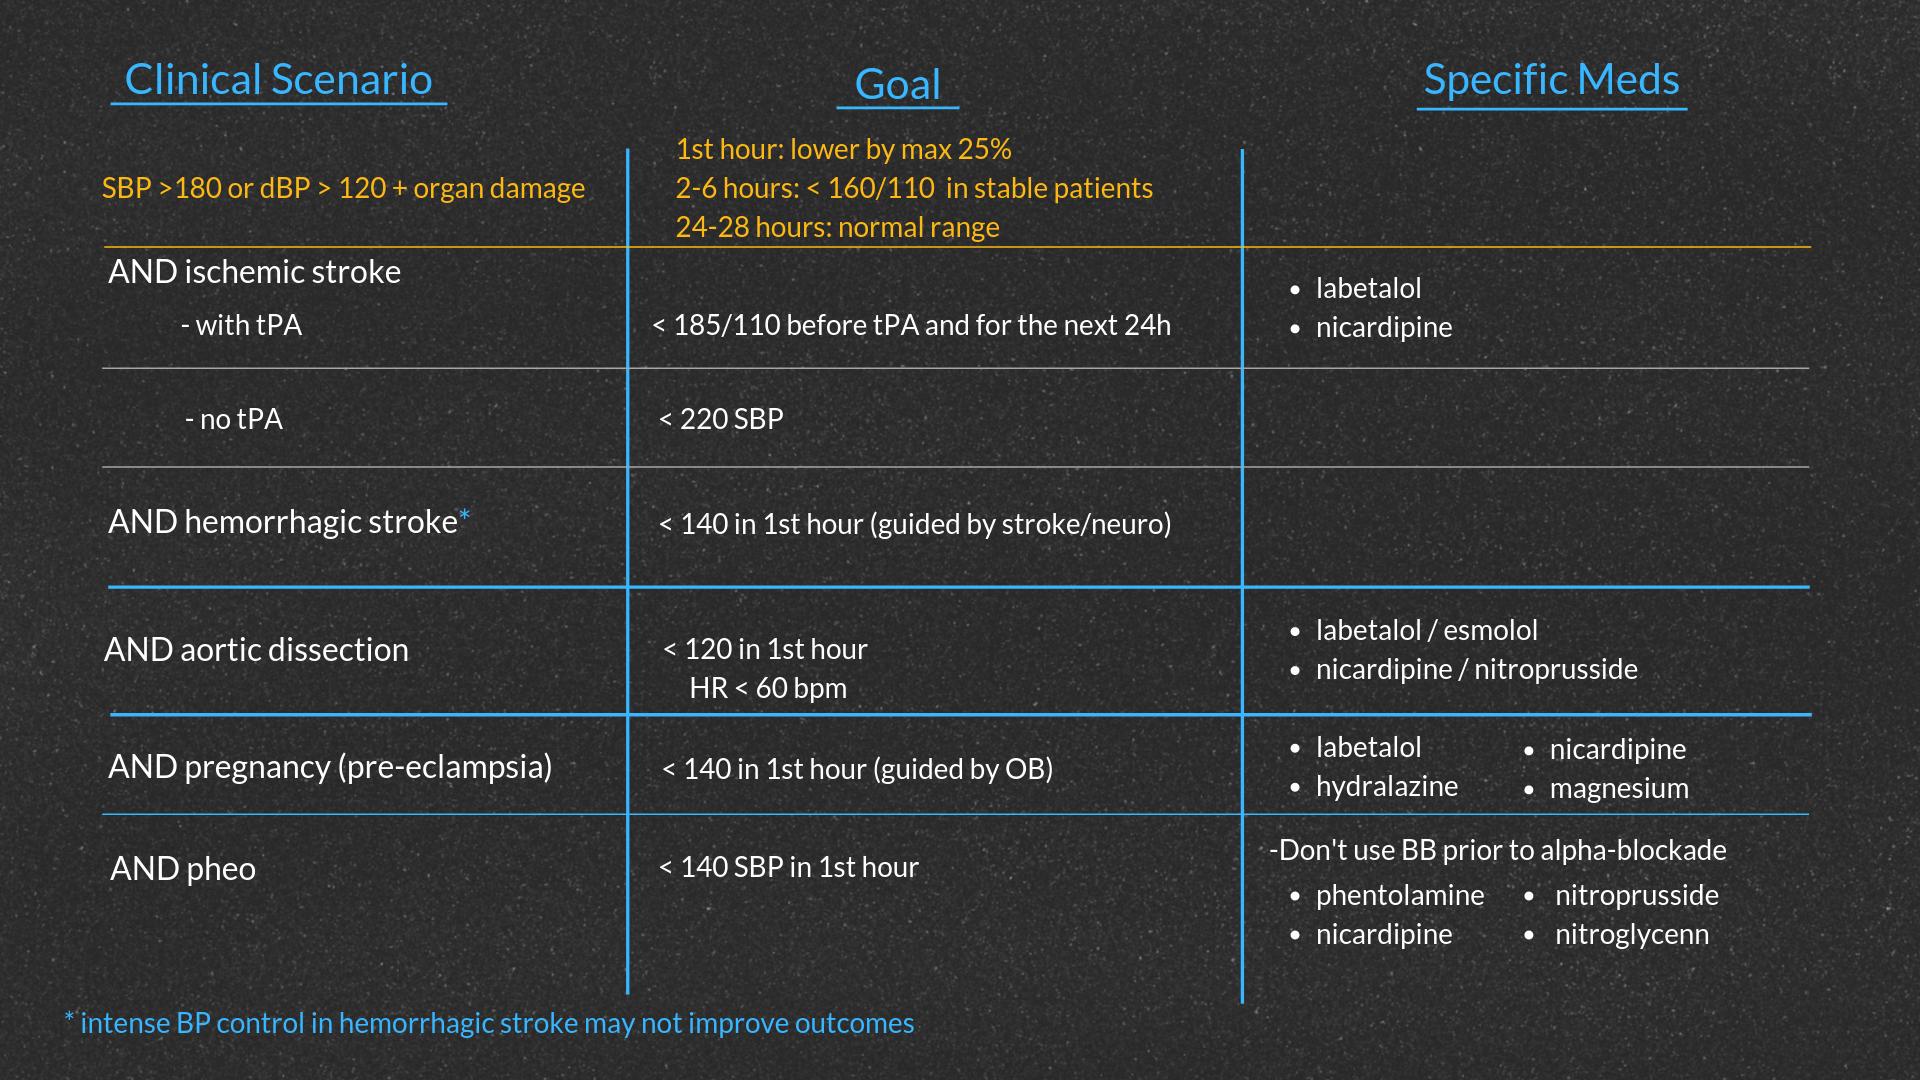 Clinical Scenario (1).png